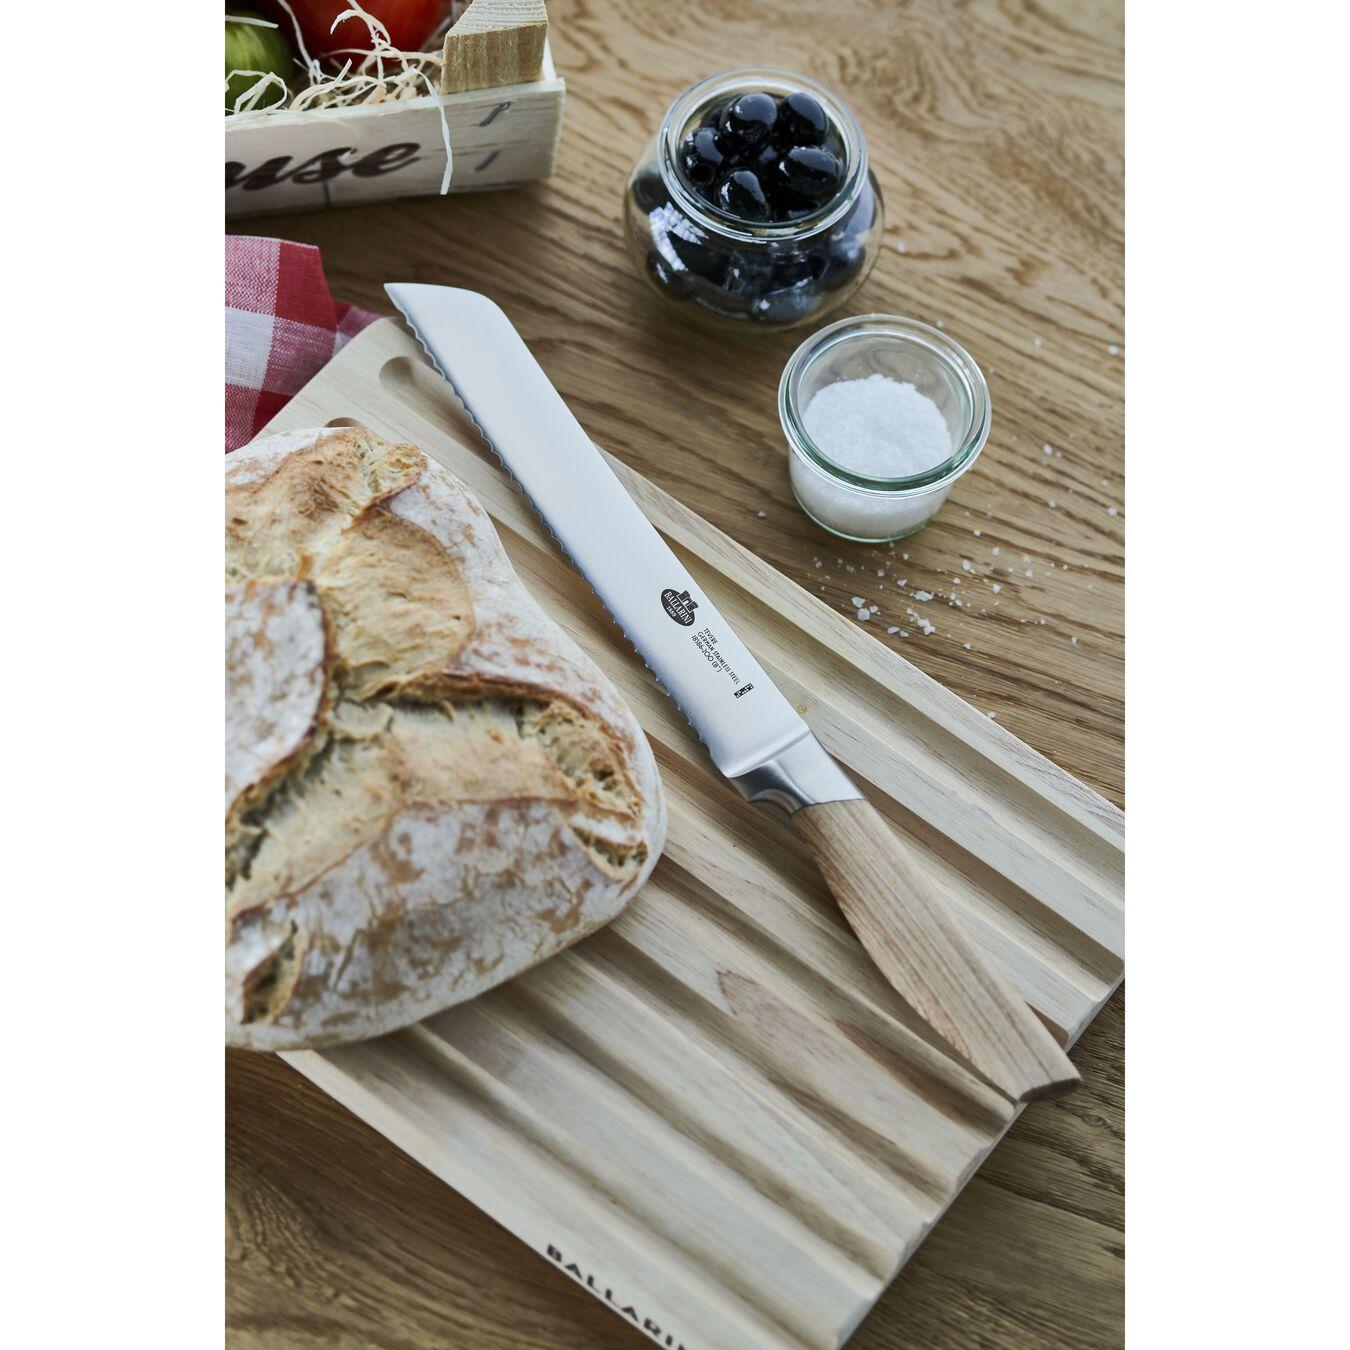 Coltello da pane seghettato - 20 cm, saldato, naturale,,large 3